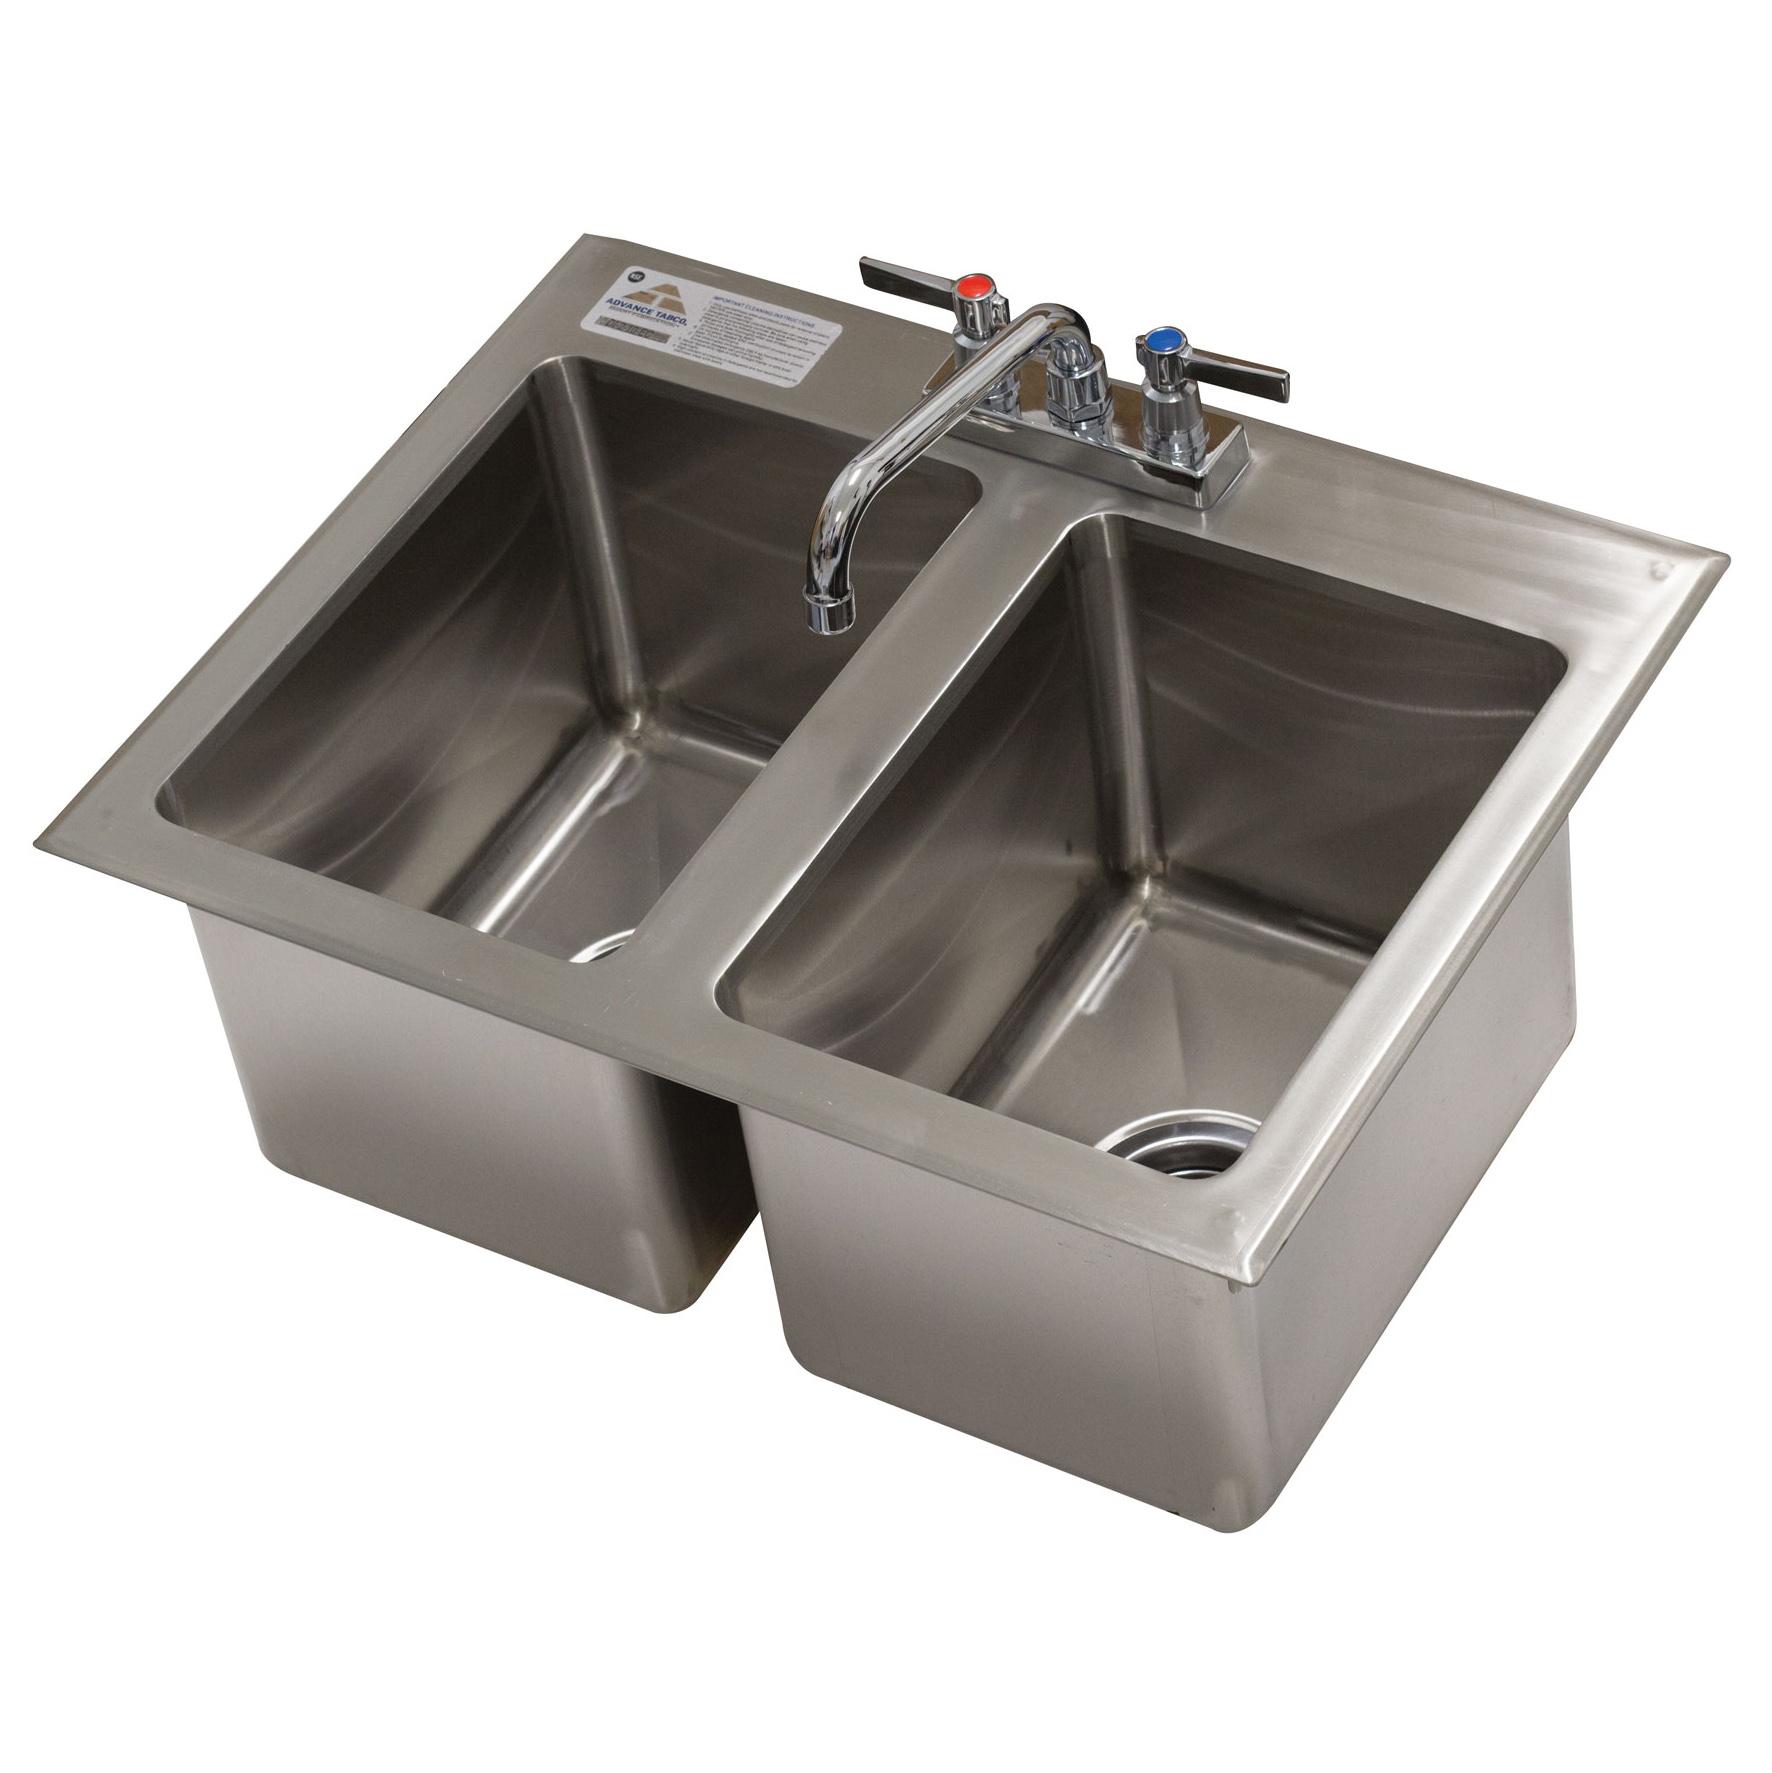 Advance Tabco DI-2-10-EC-X sink, drop-in